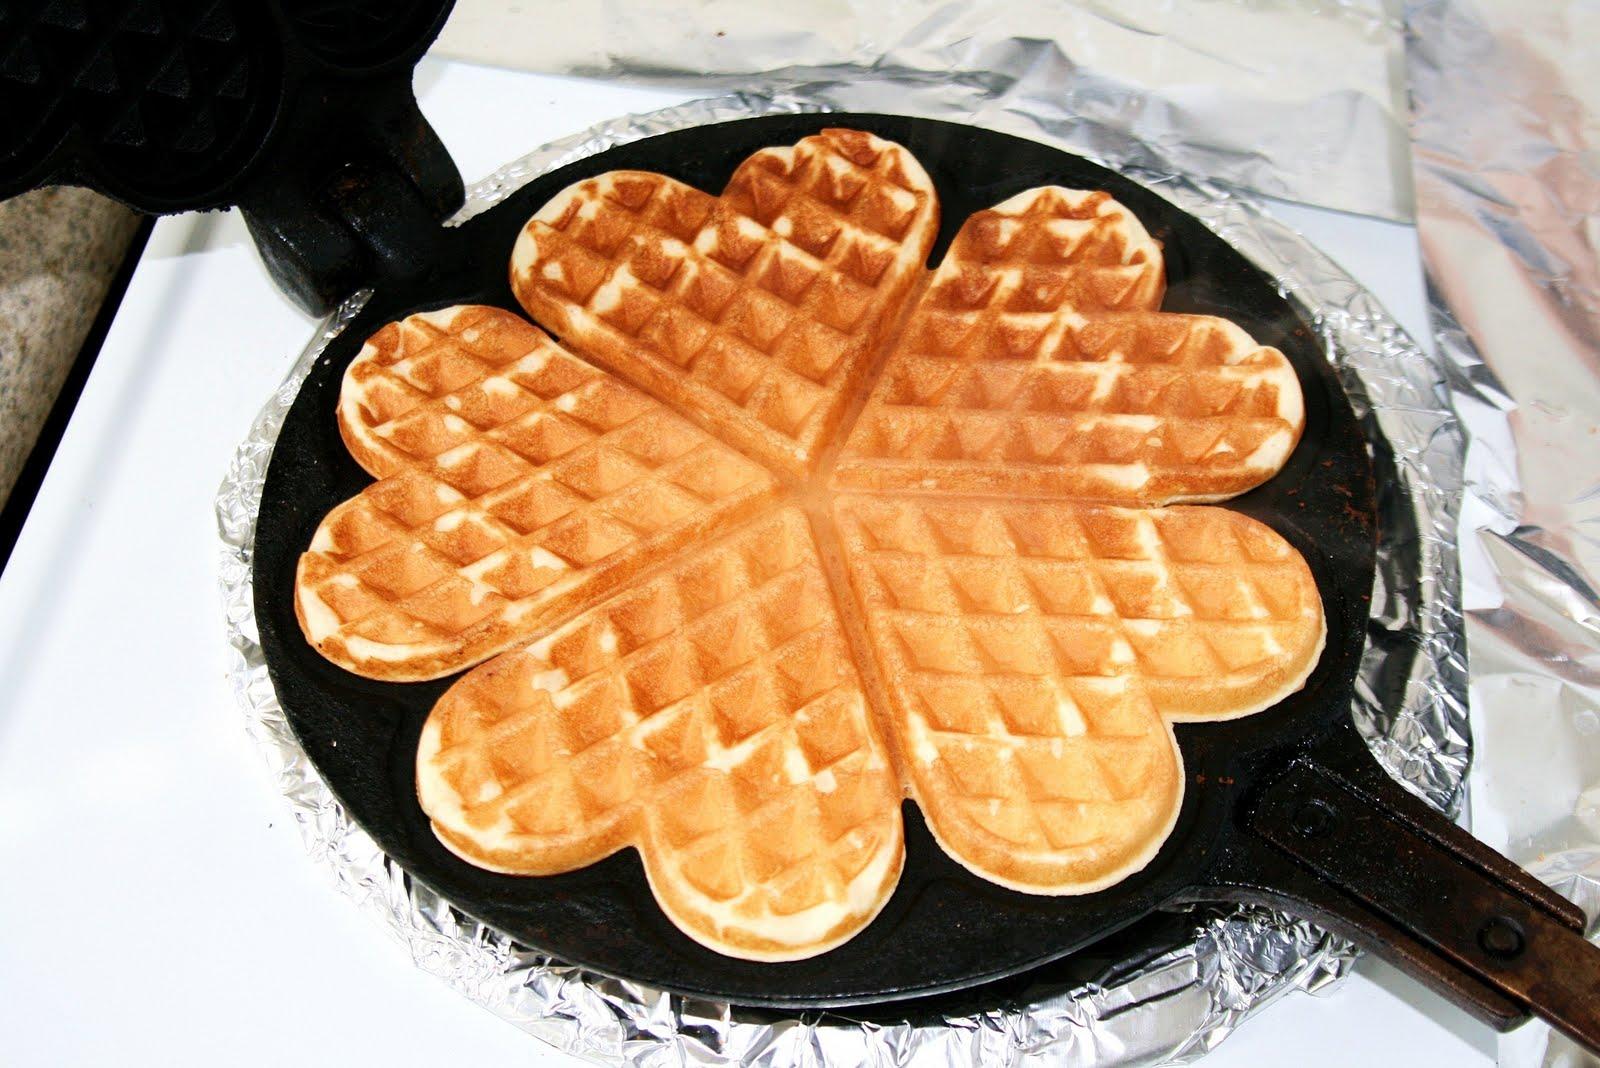 Campfire Maker Waffle Iron Cast